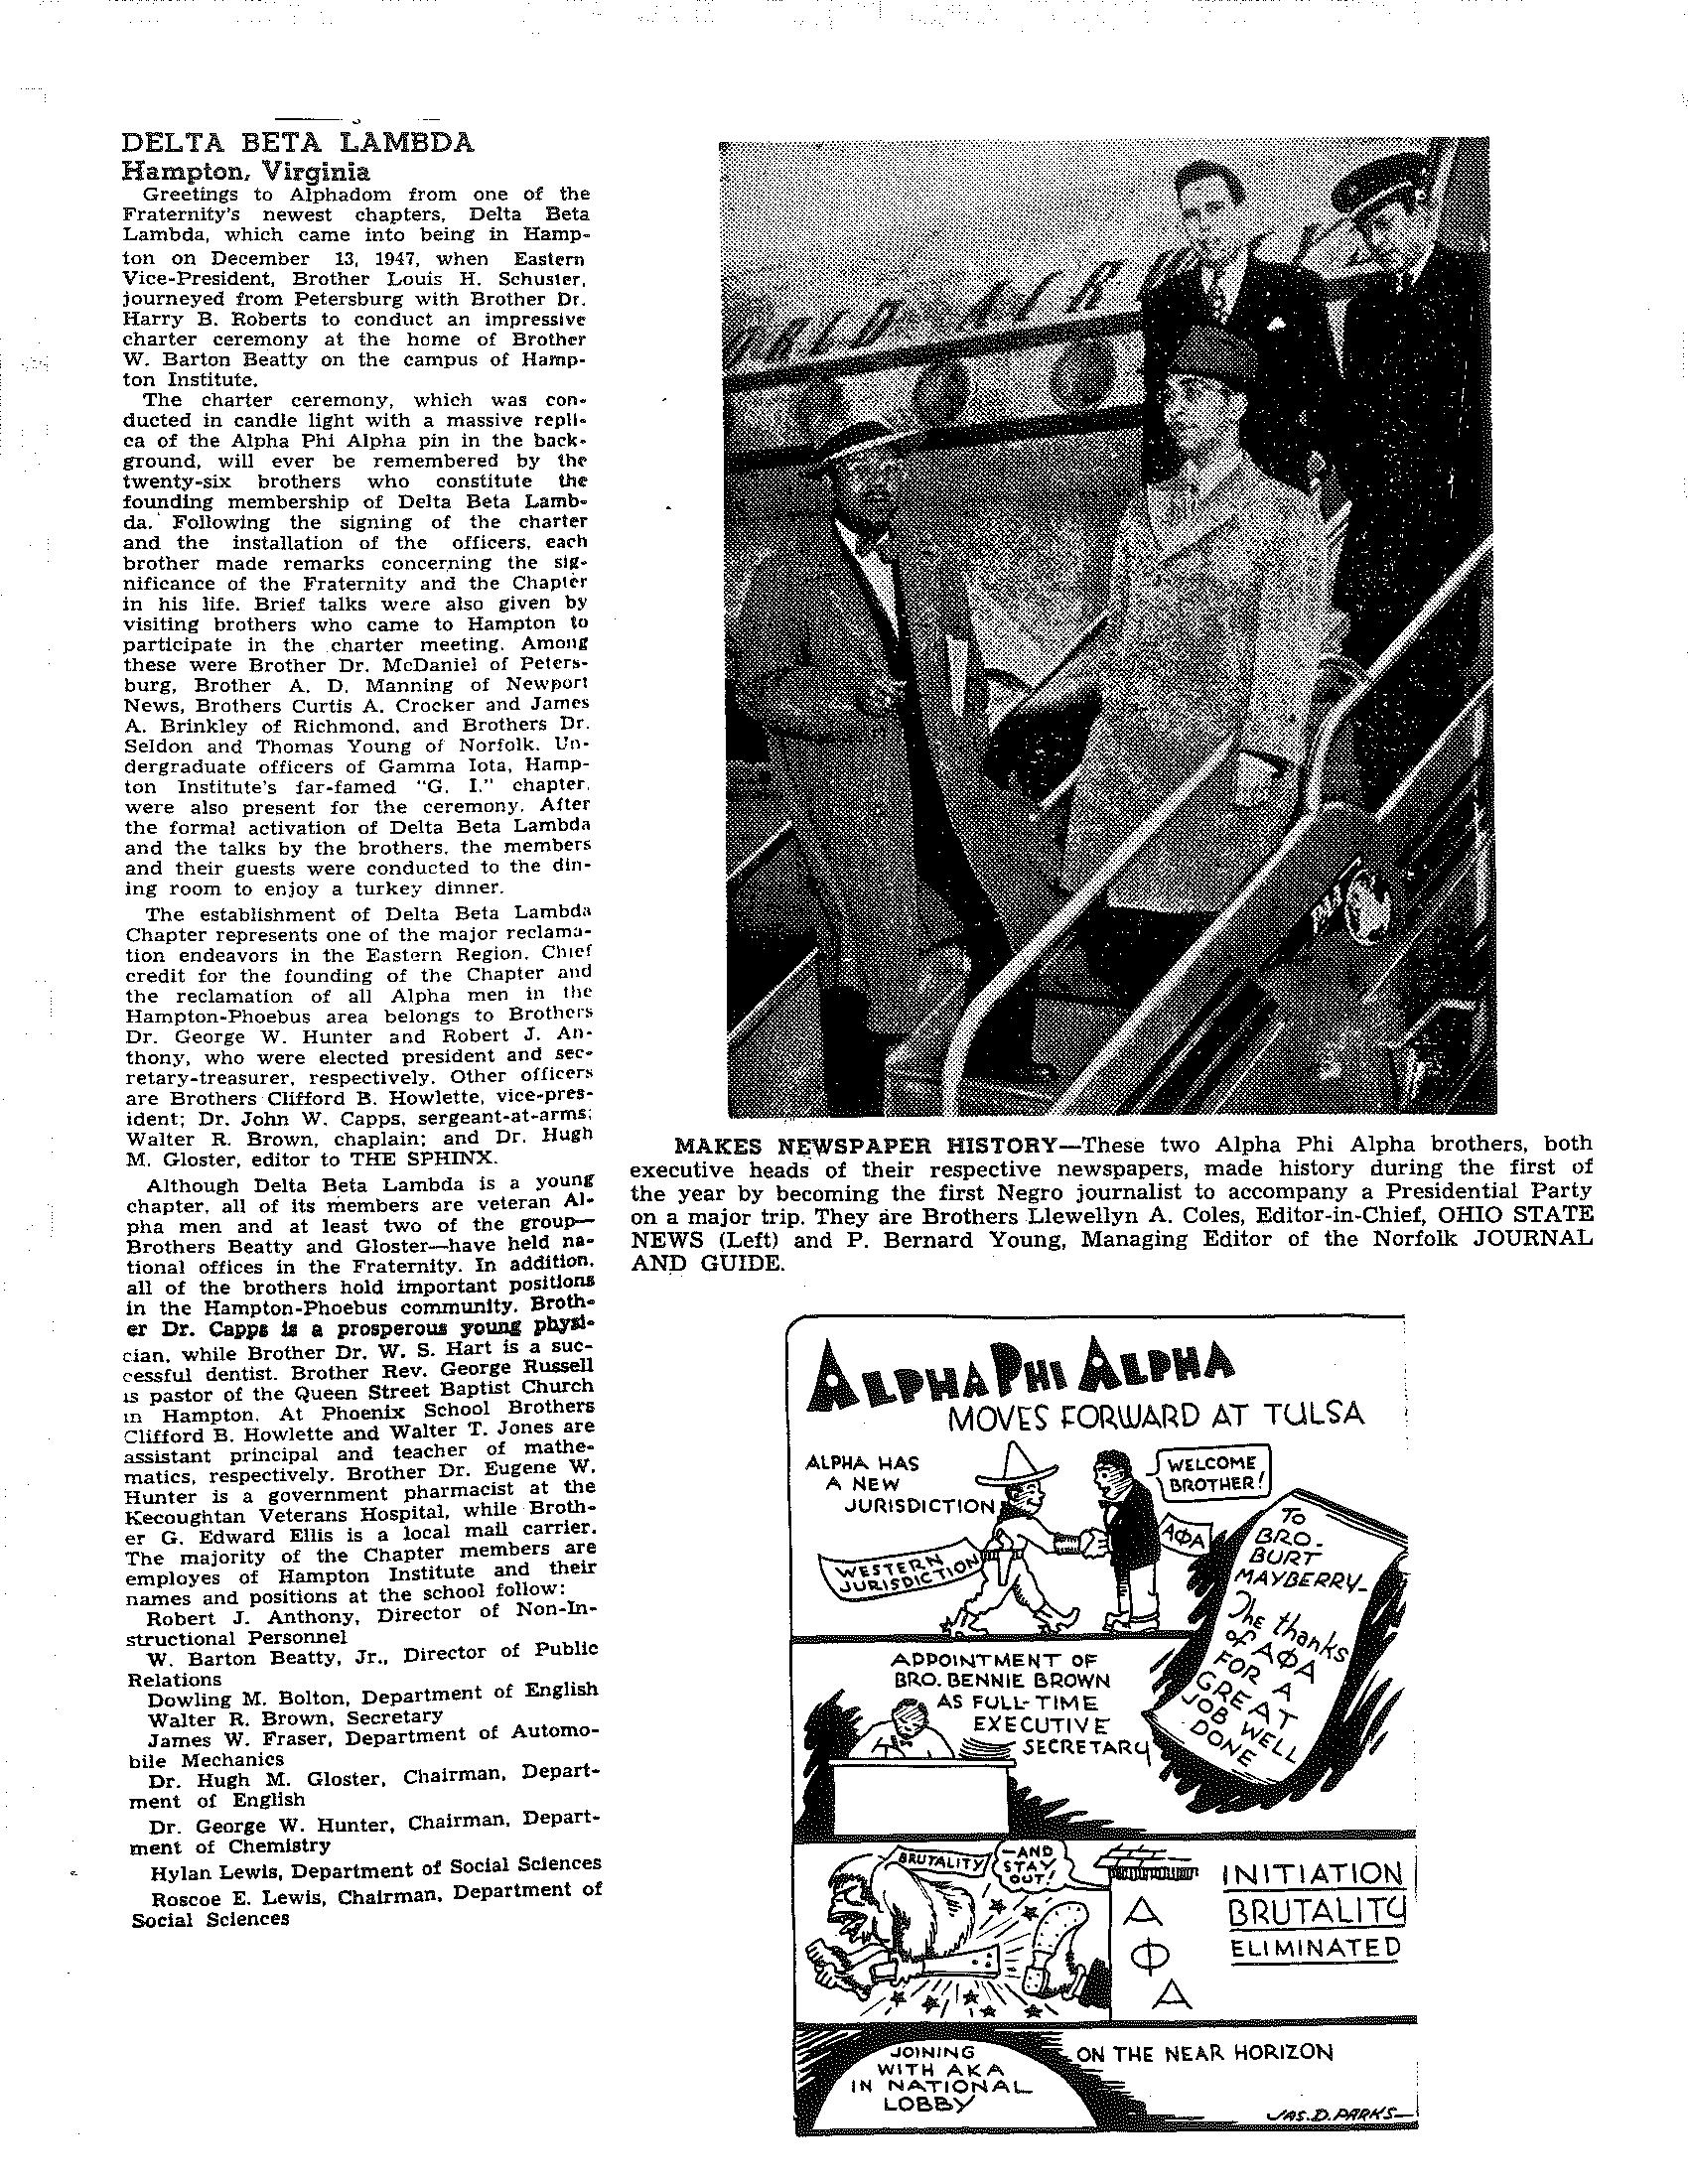 Zeta Lambda 1947 Newspaper Heads and DBL.png